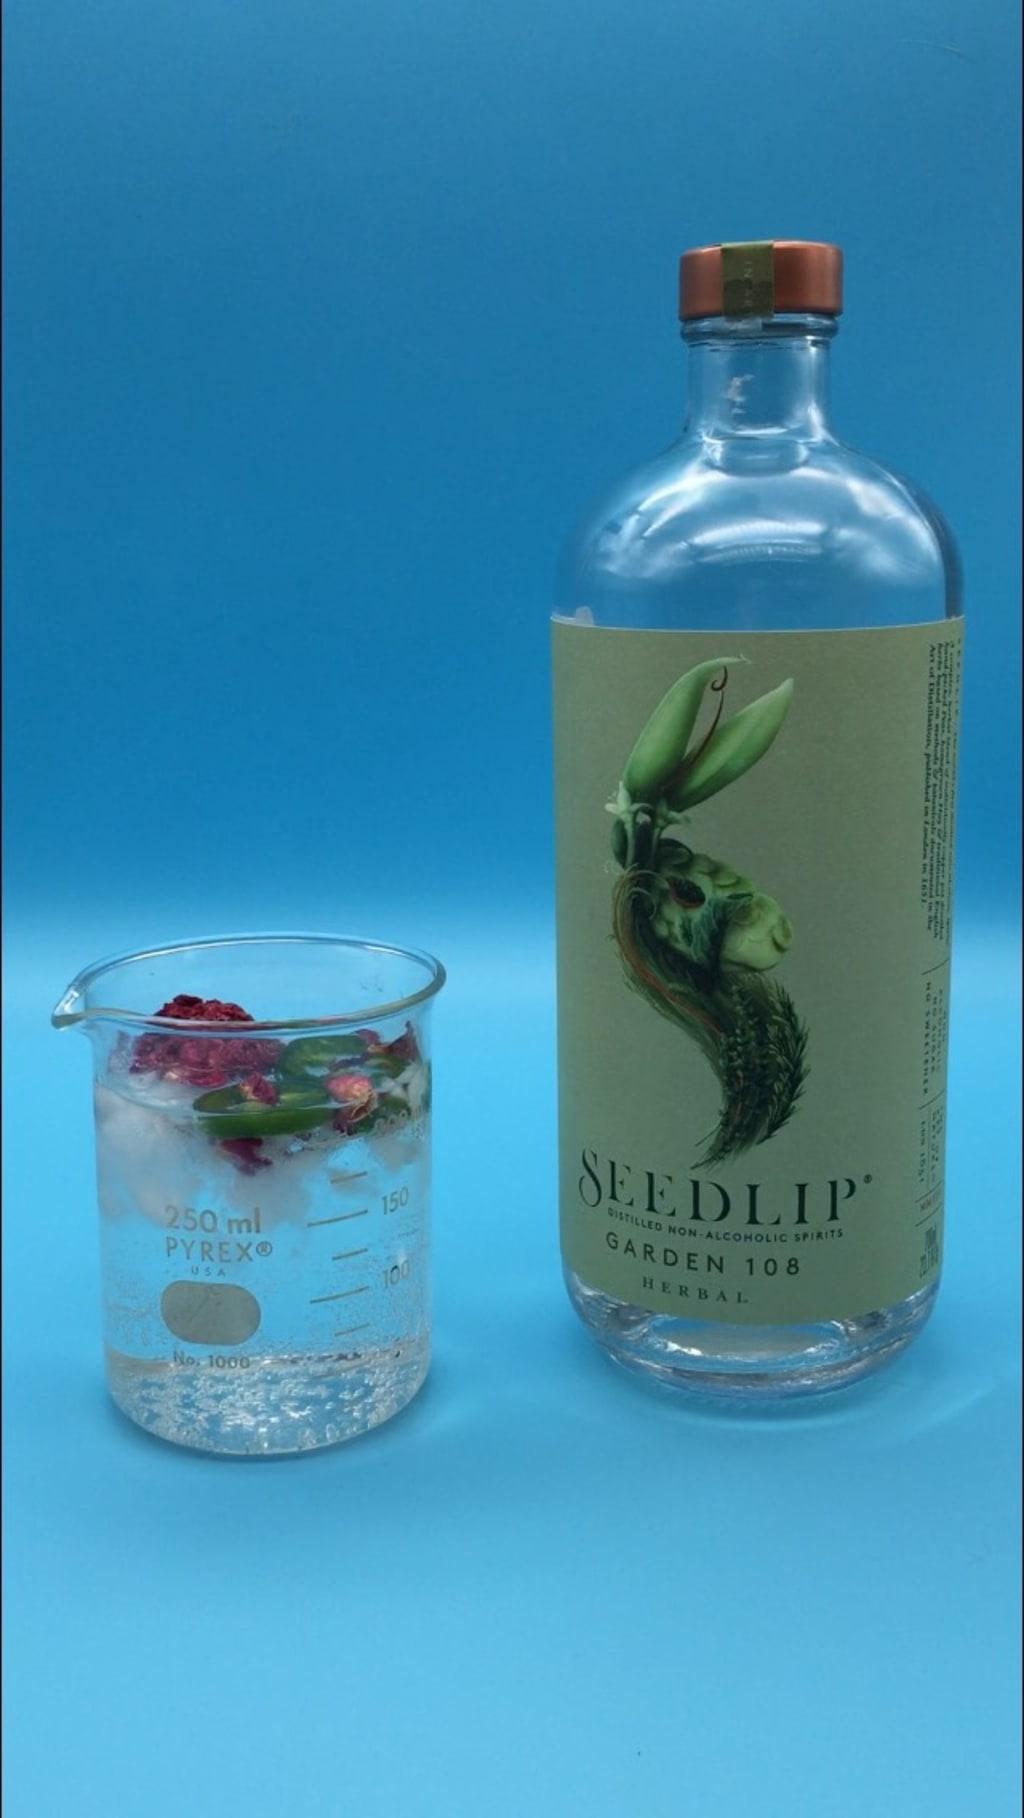 Seedlip Review